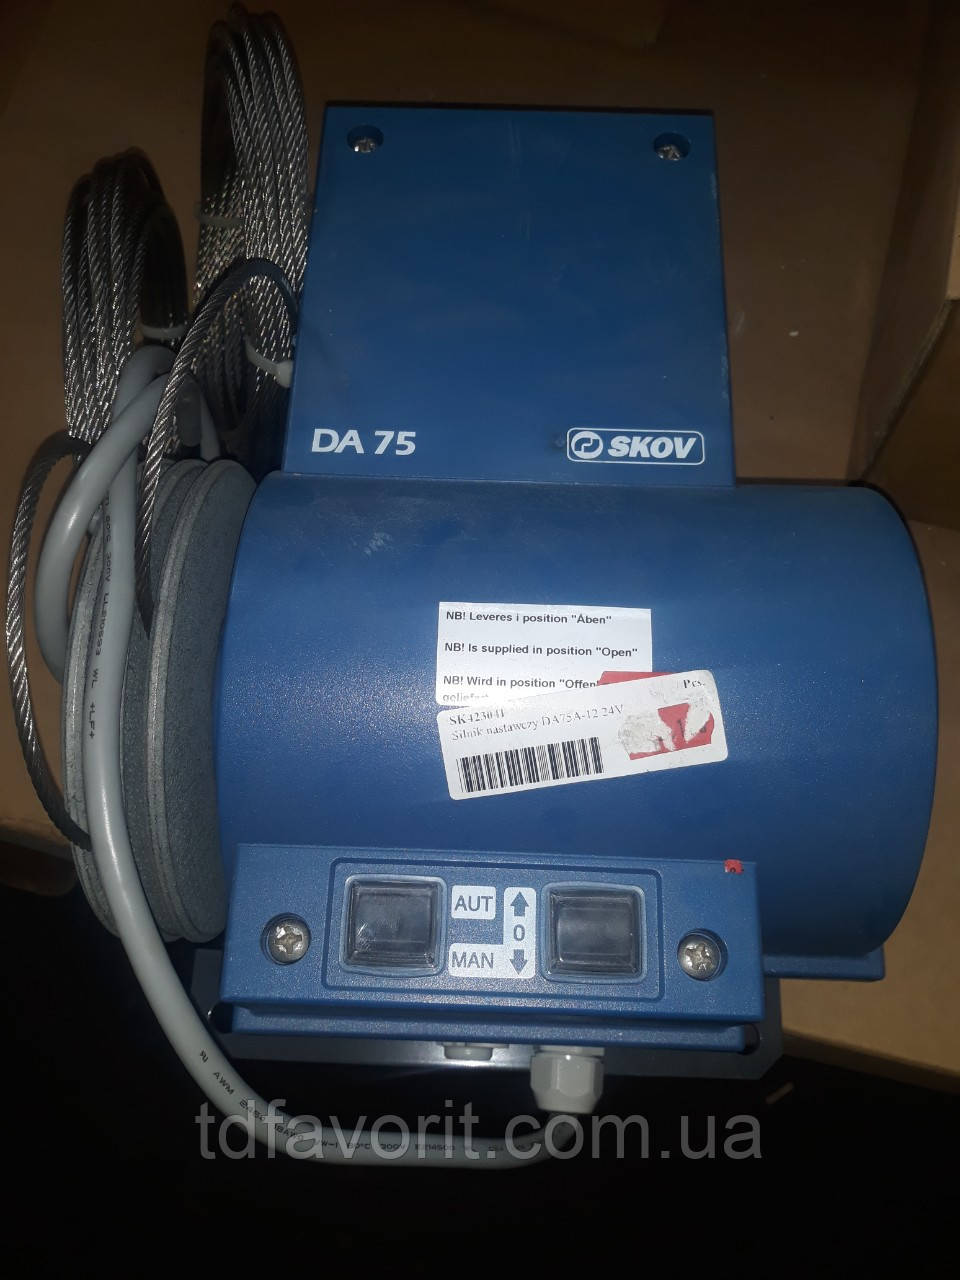 Серводвигатель Skov DA 75A-12 -24 V